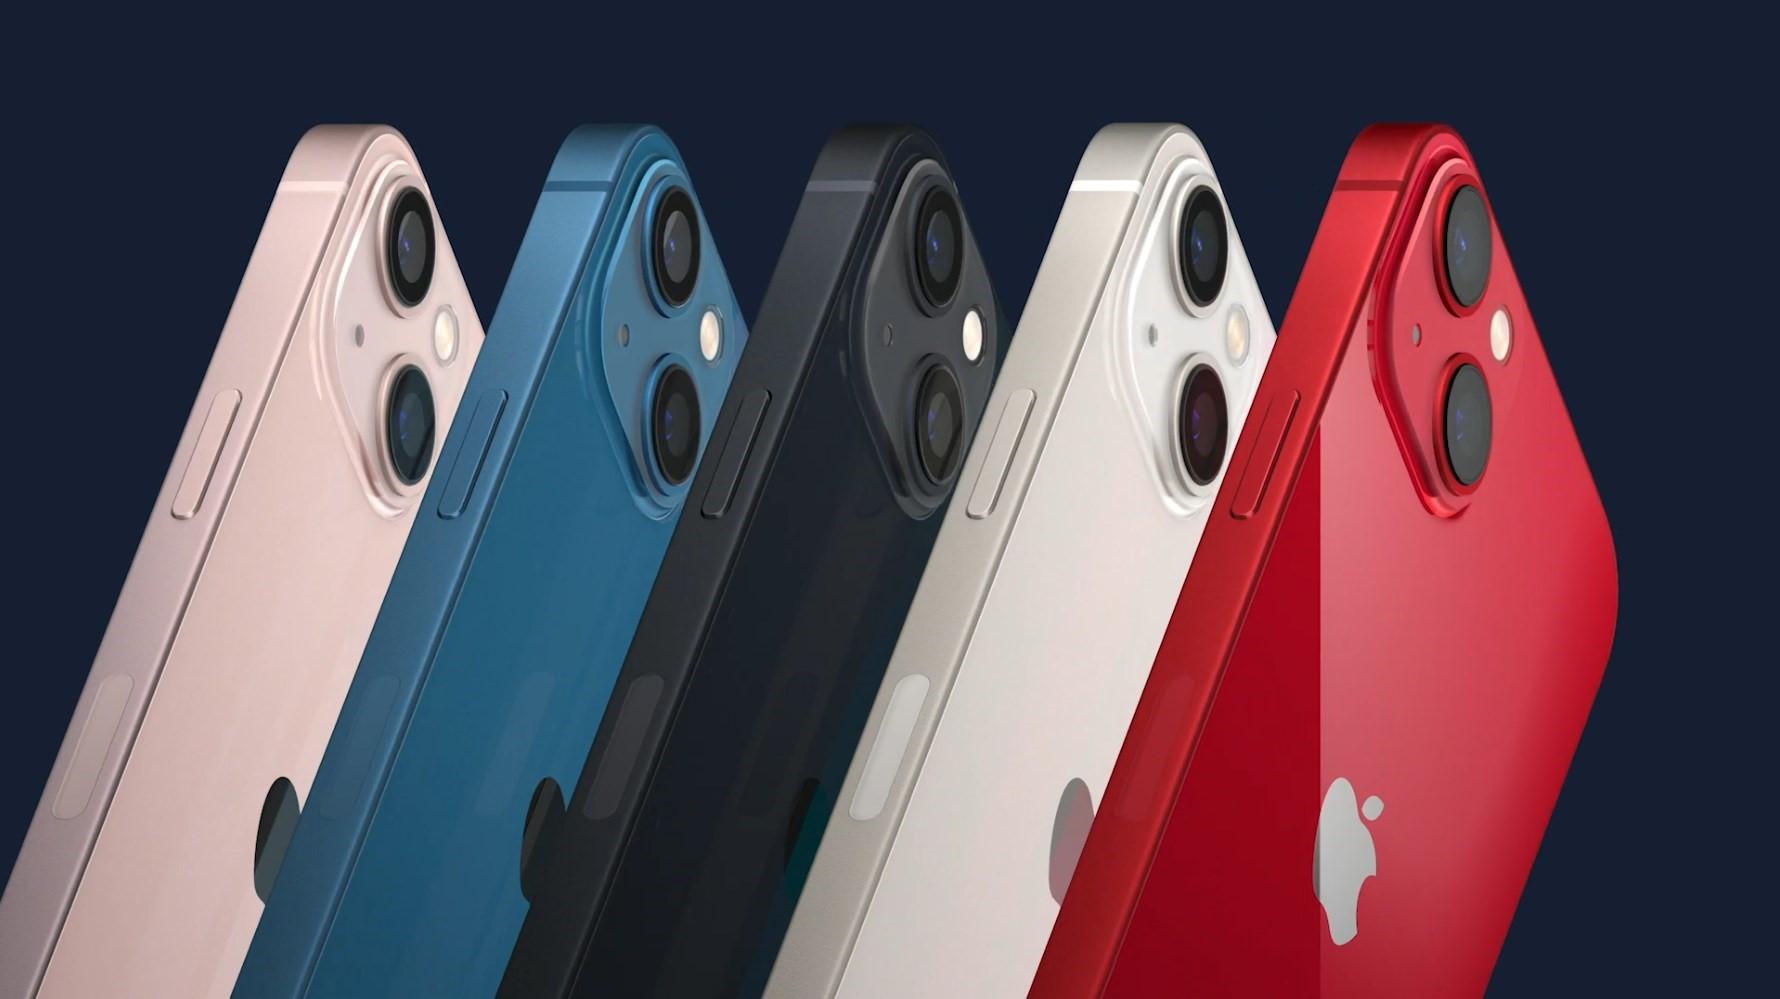 Apple ra mắt iPhone 13 và Watch Series 7 - page 2 - 4